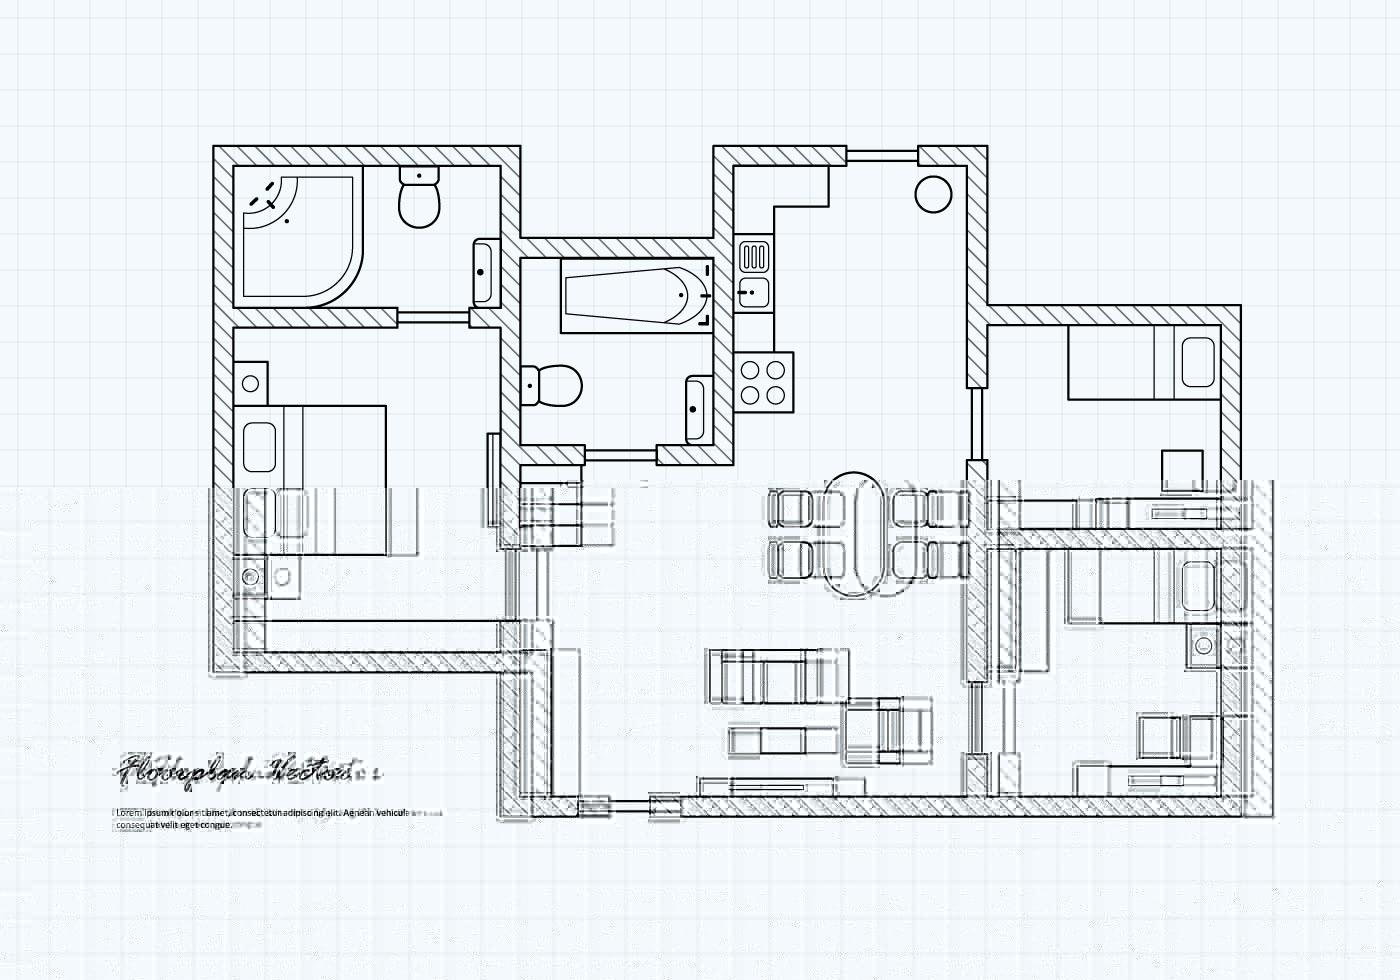 electrical floor plan design